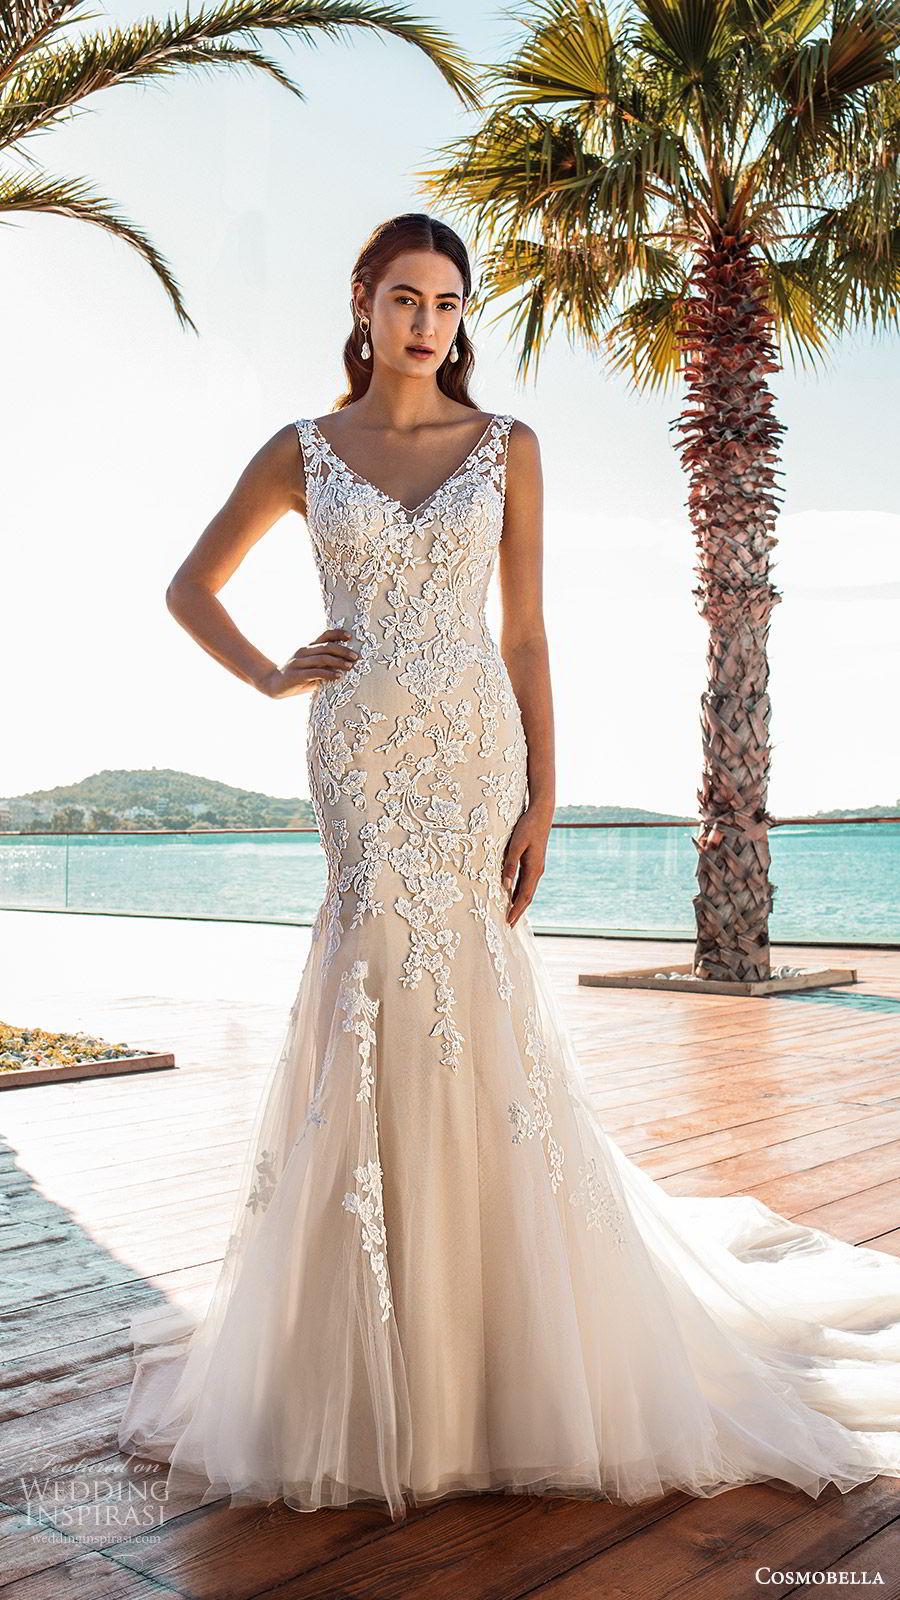 cosmobella 2020 bridal sleeveless sheer straps v neckline fully embellished lace trumpet fit flare wedding dress (5) romantic elegant low back chapel train mv